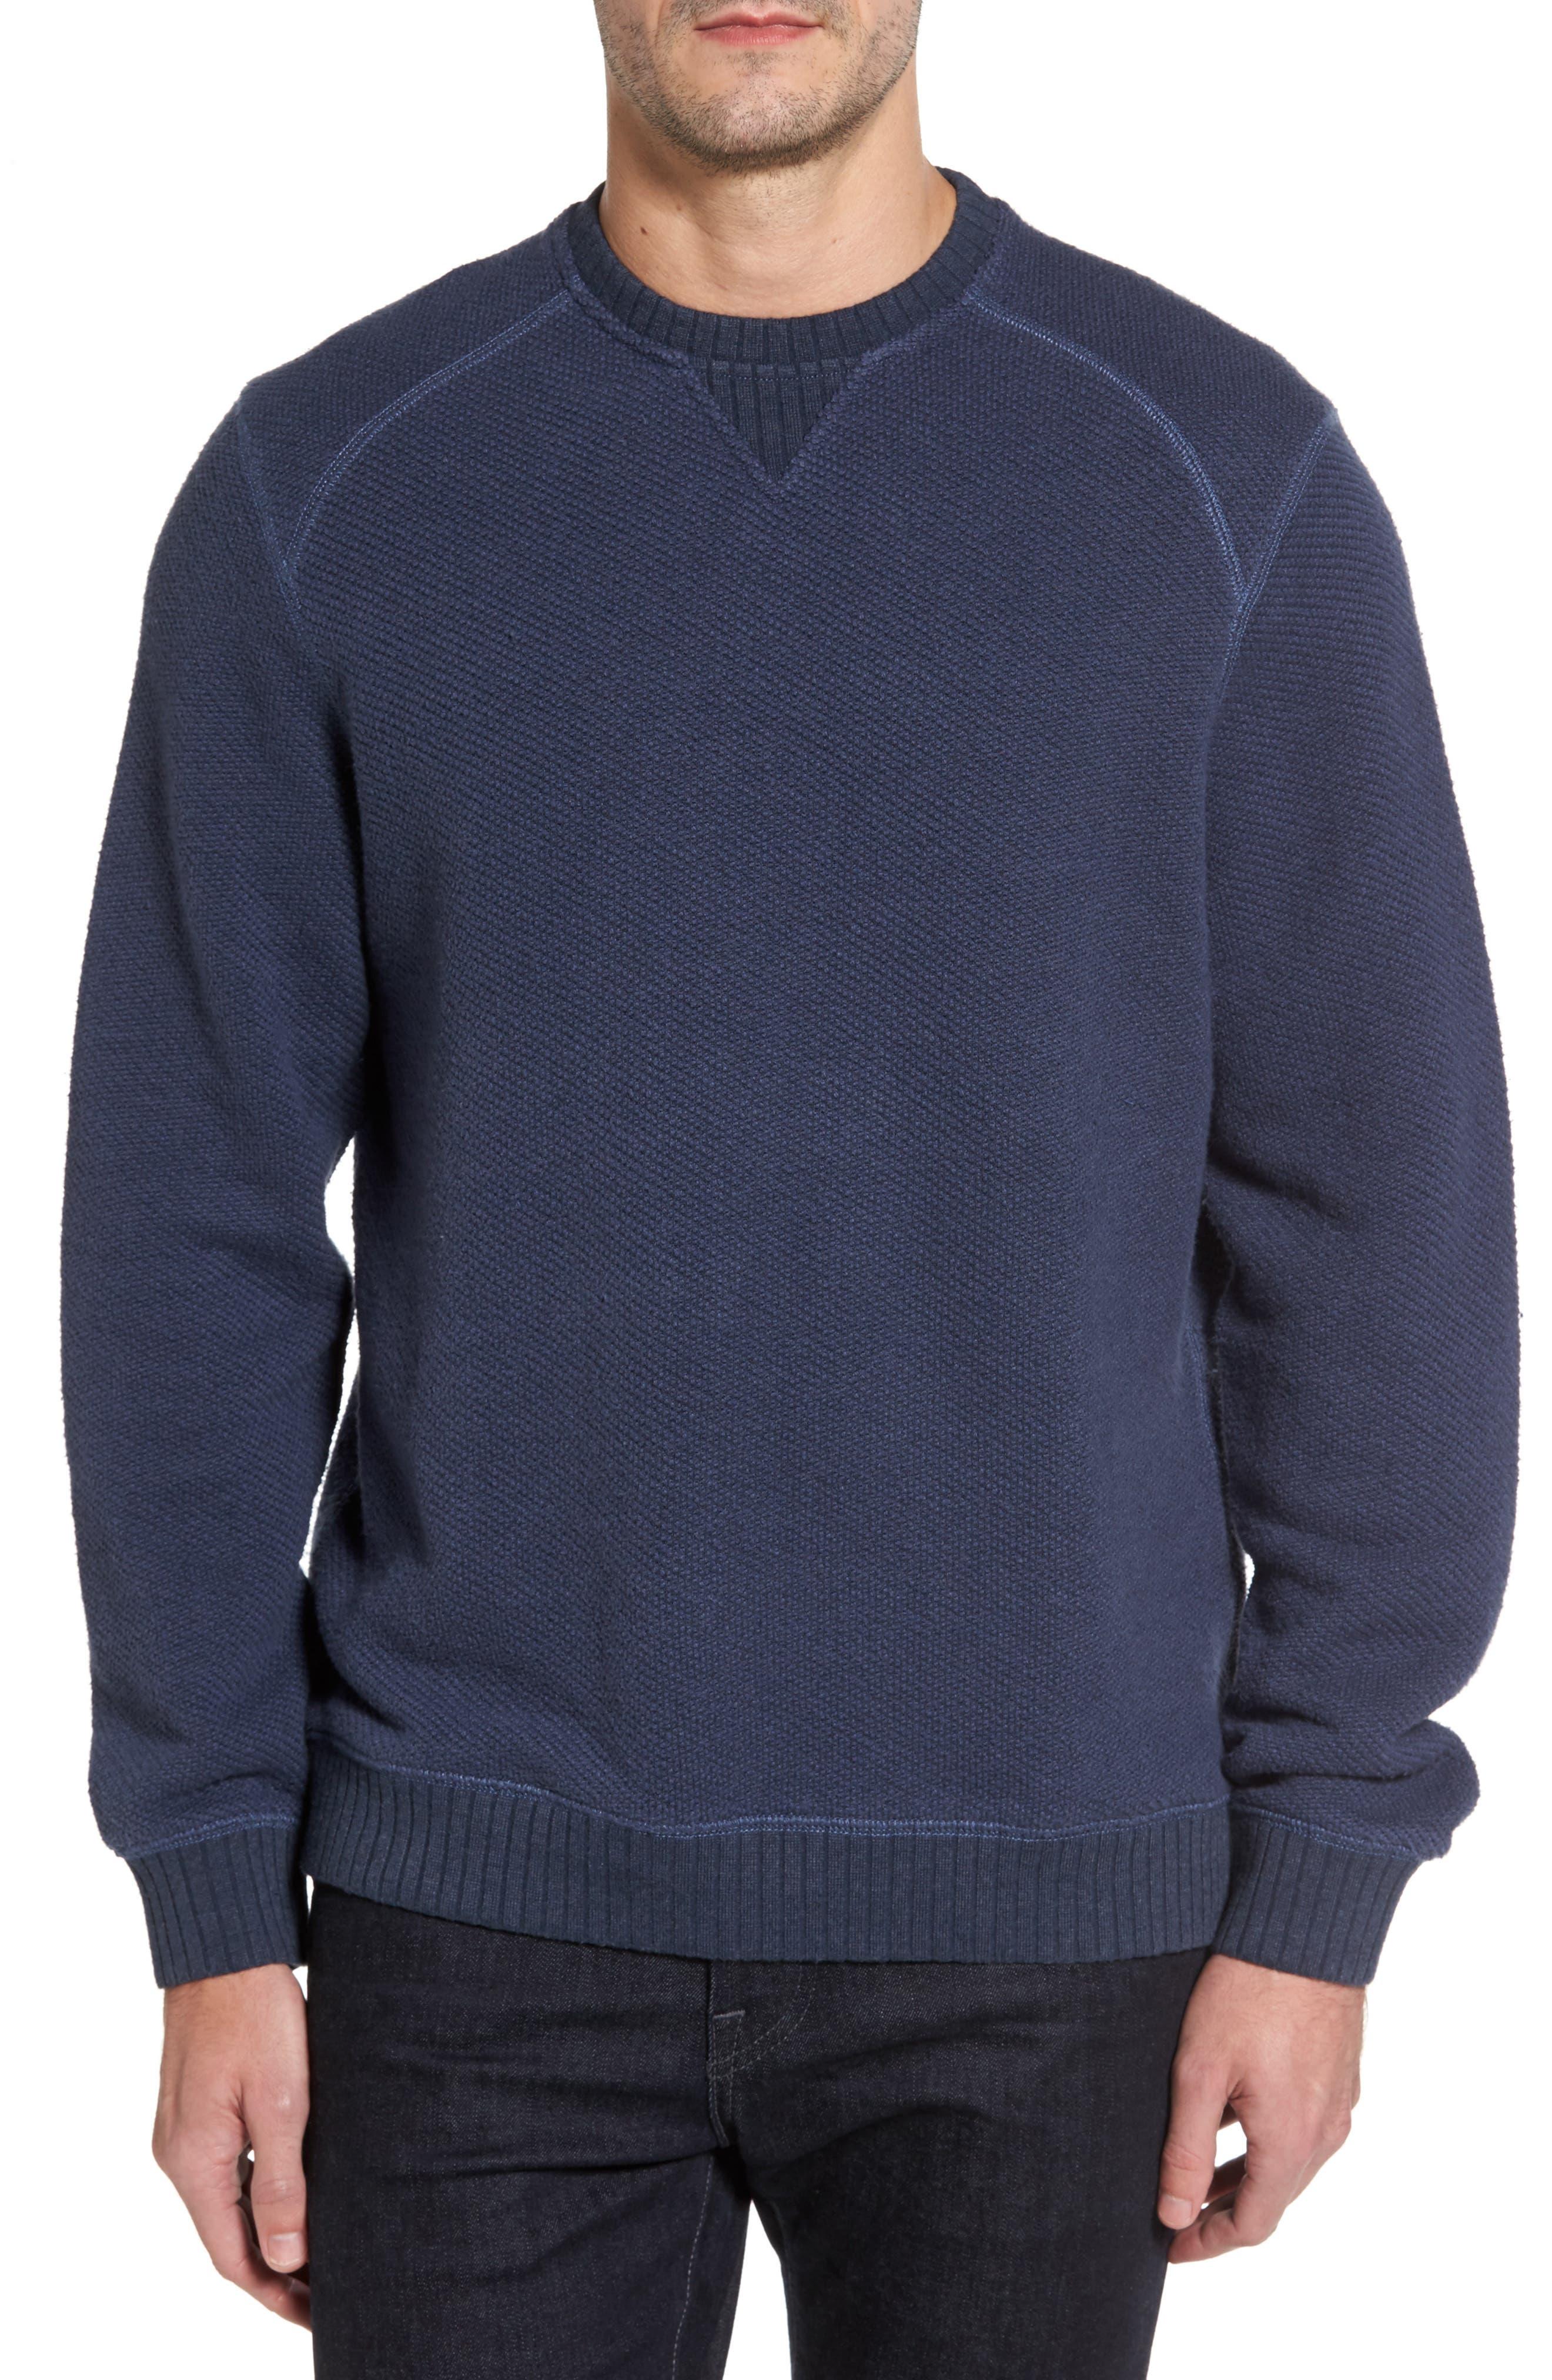 Surfari Crewneck Sweatshirt,                         Main,                         color, Ocean Deep Heather